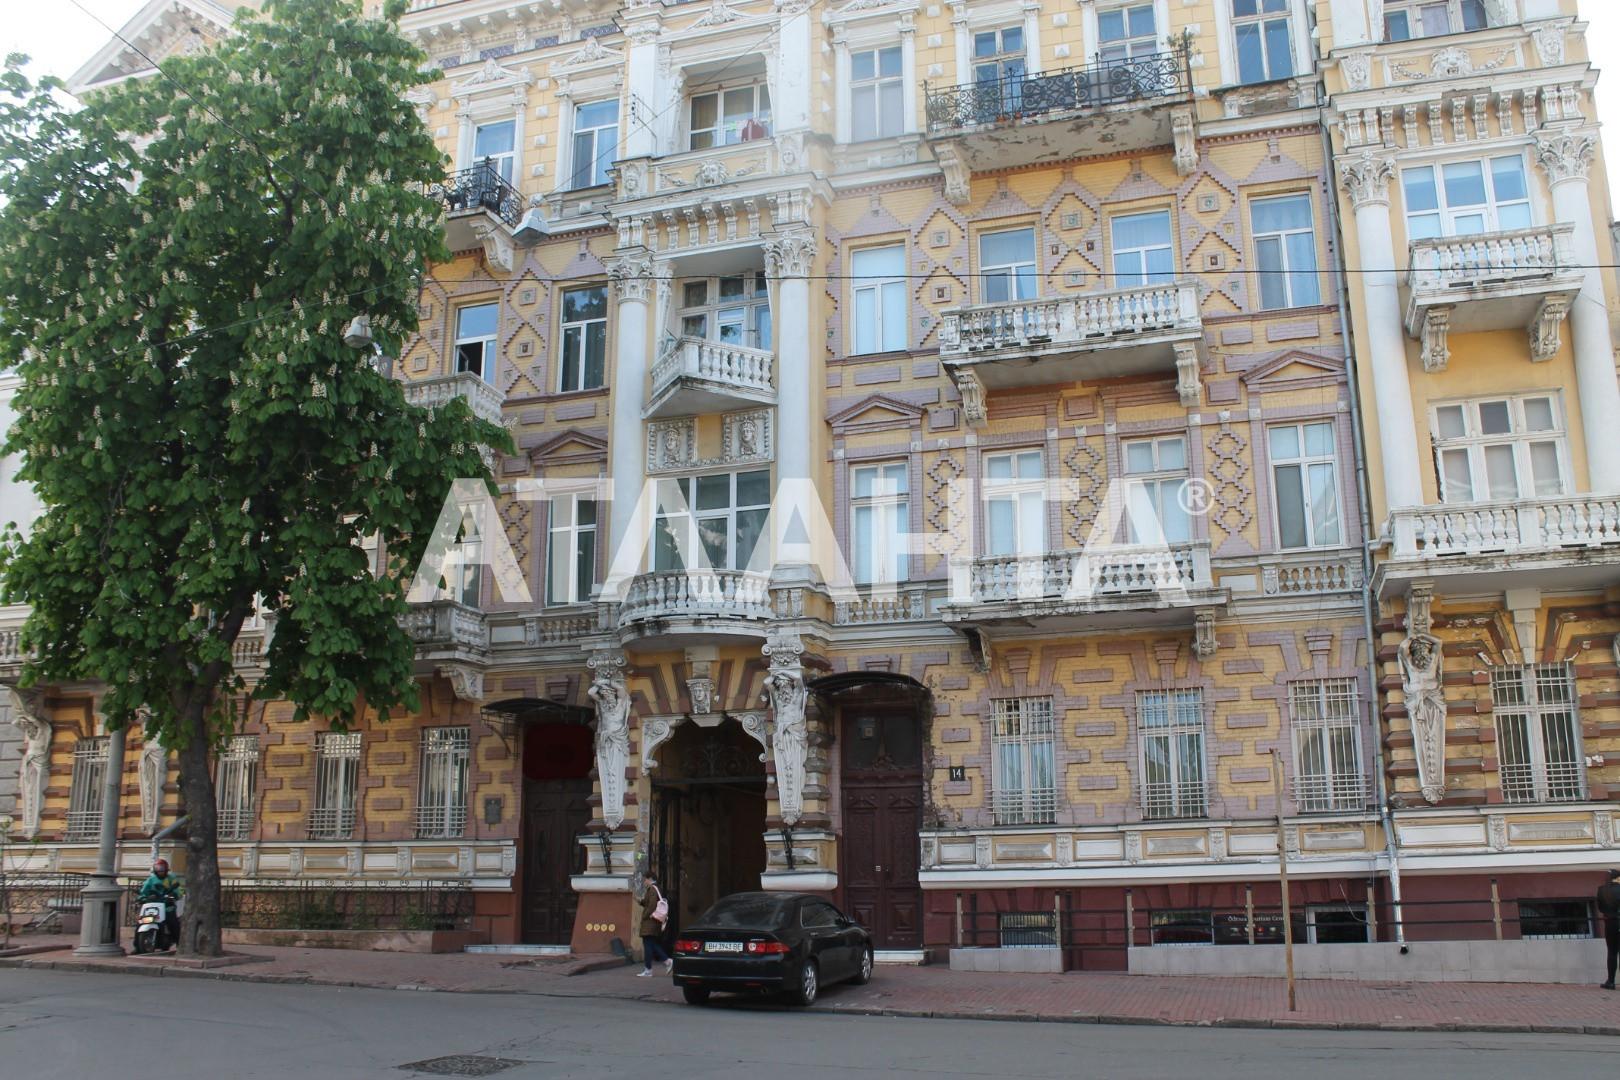 Продается 1-комнатная Квартира на ул. Гоголя — 35 000 у.е. (фото №8)